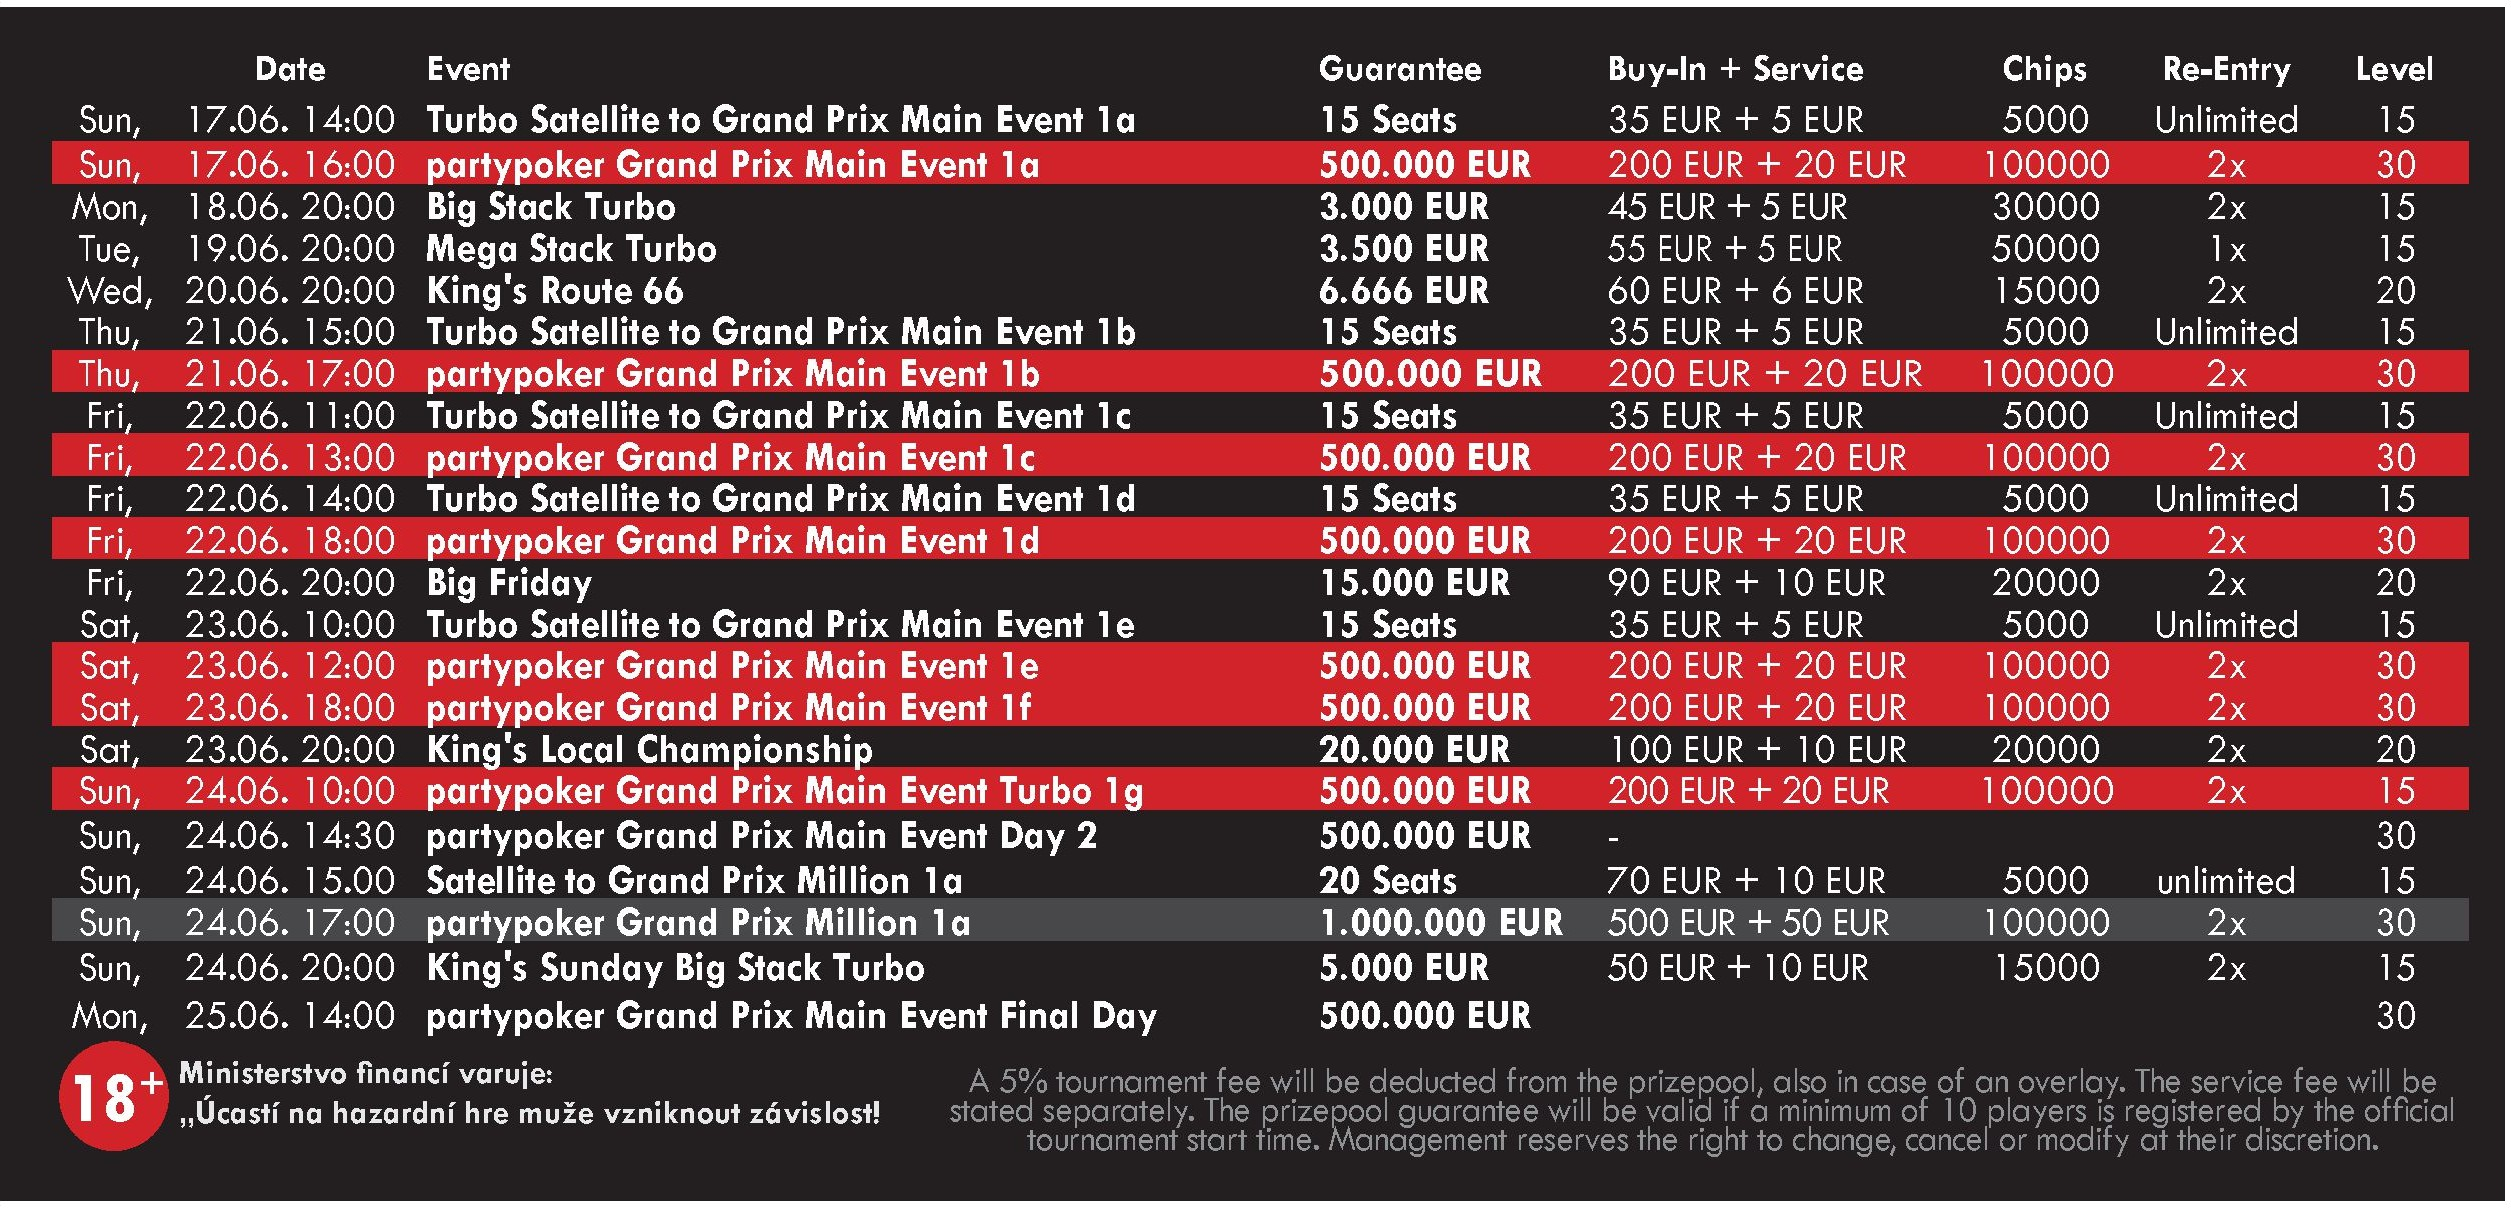 Schedule partypoker Grand Prix Germany